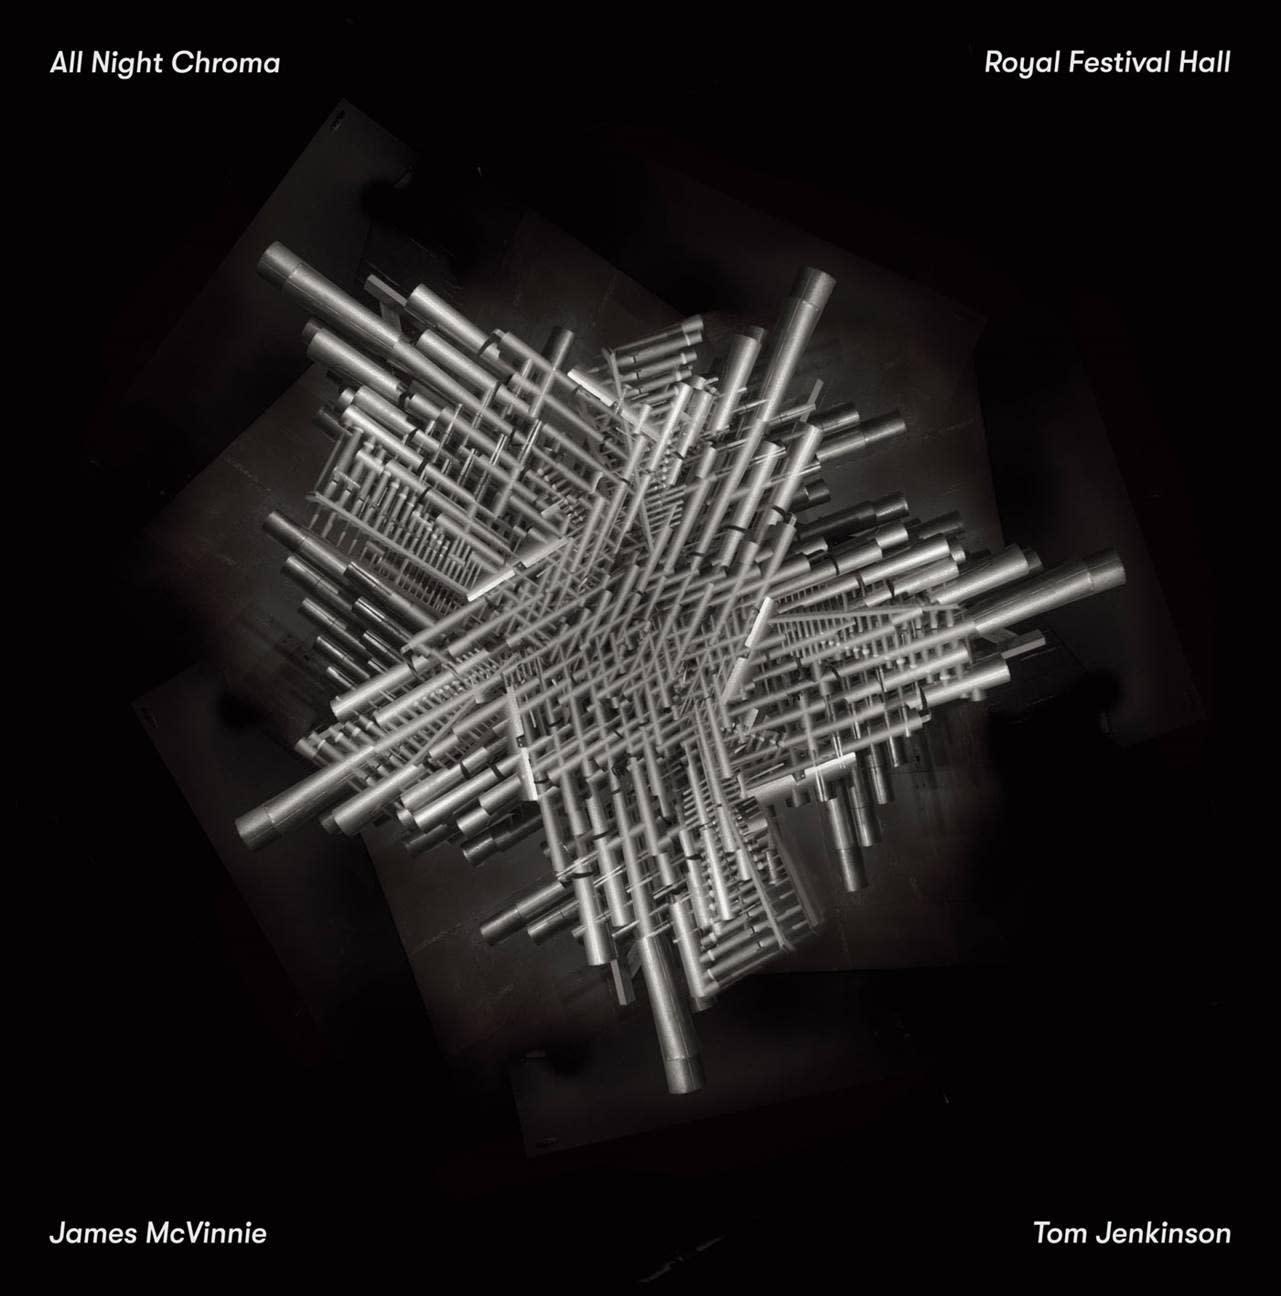 Warp James McVinnie - All Night Chroma